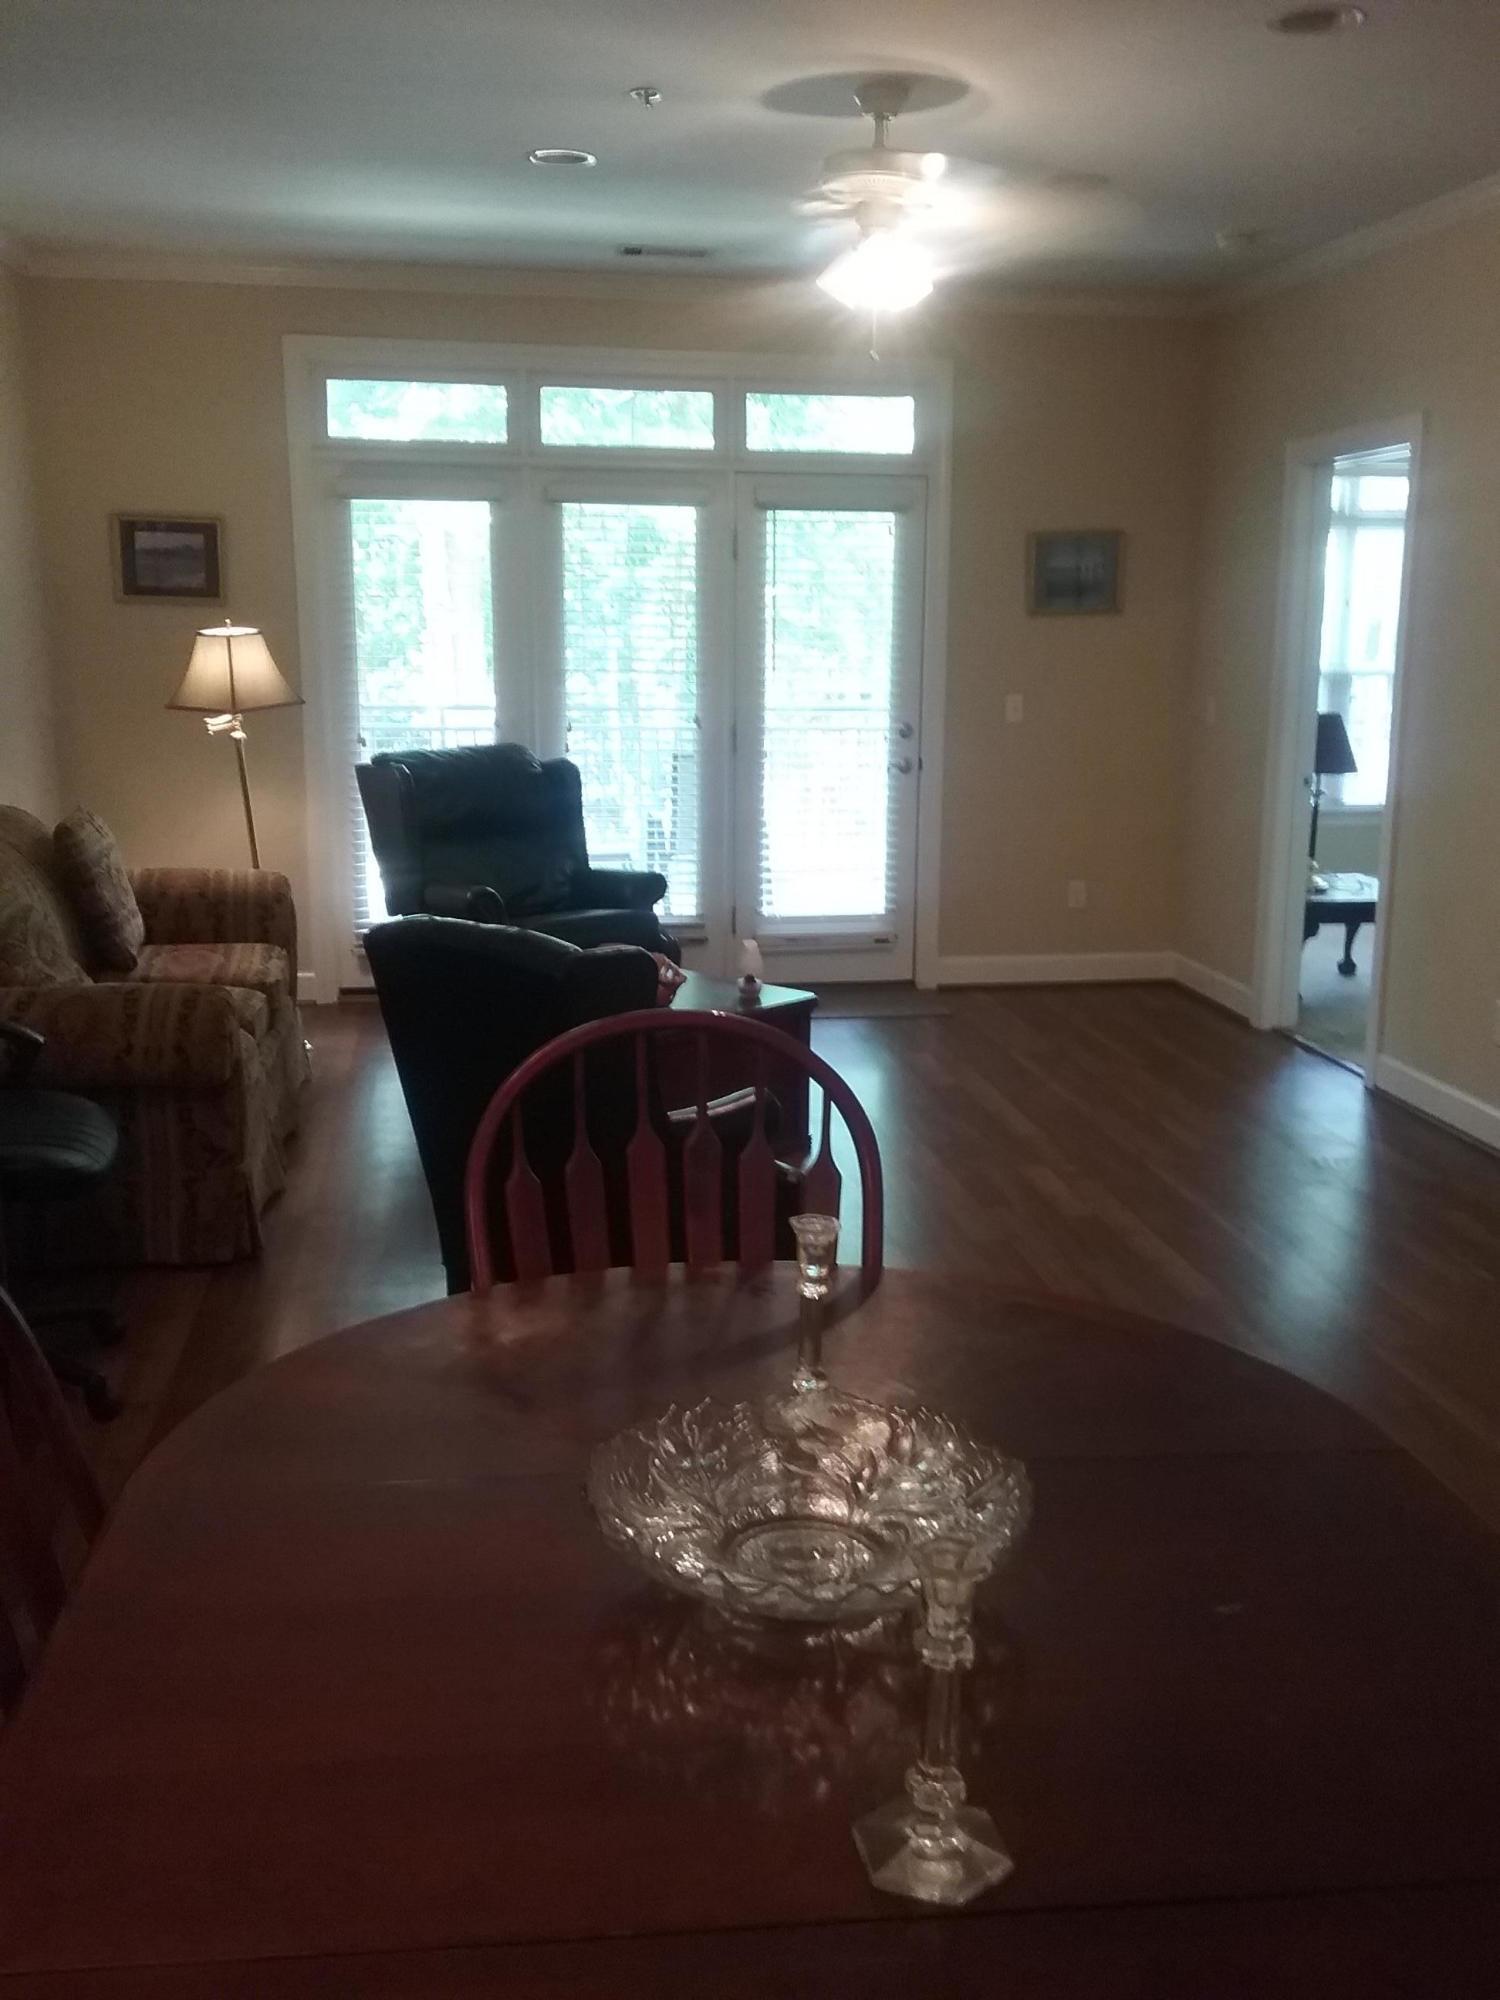 Ballards Pointe II Homes For Sale - 103 Ballard, Santee, SC - 9